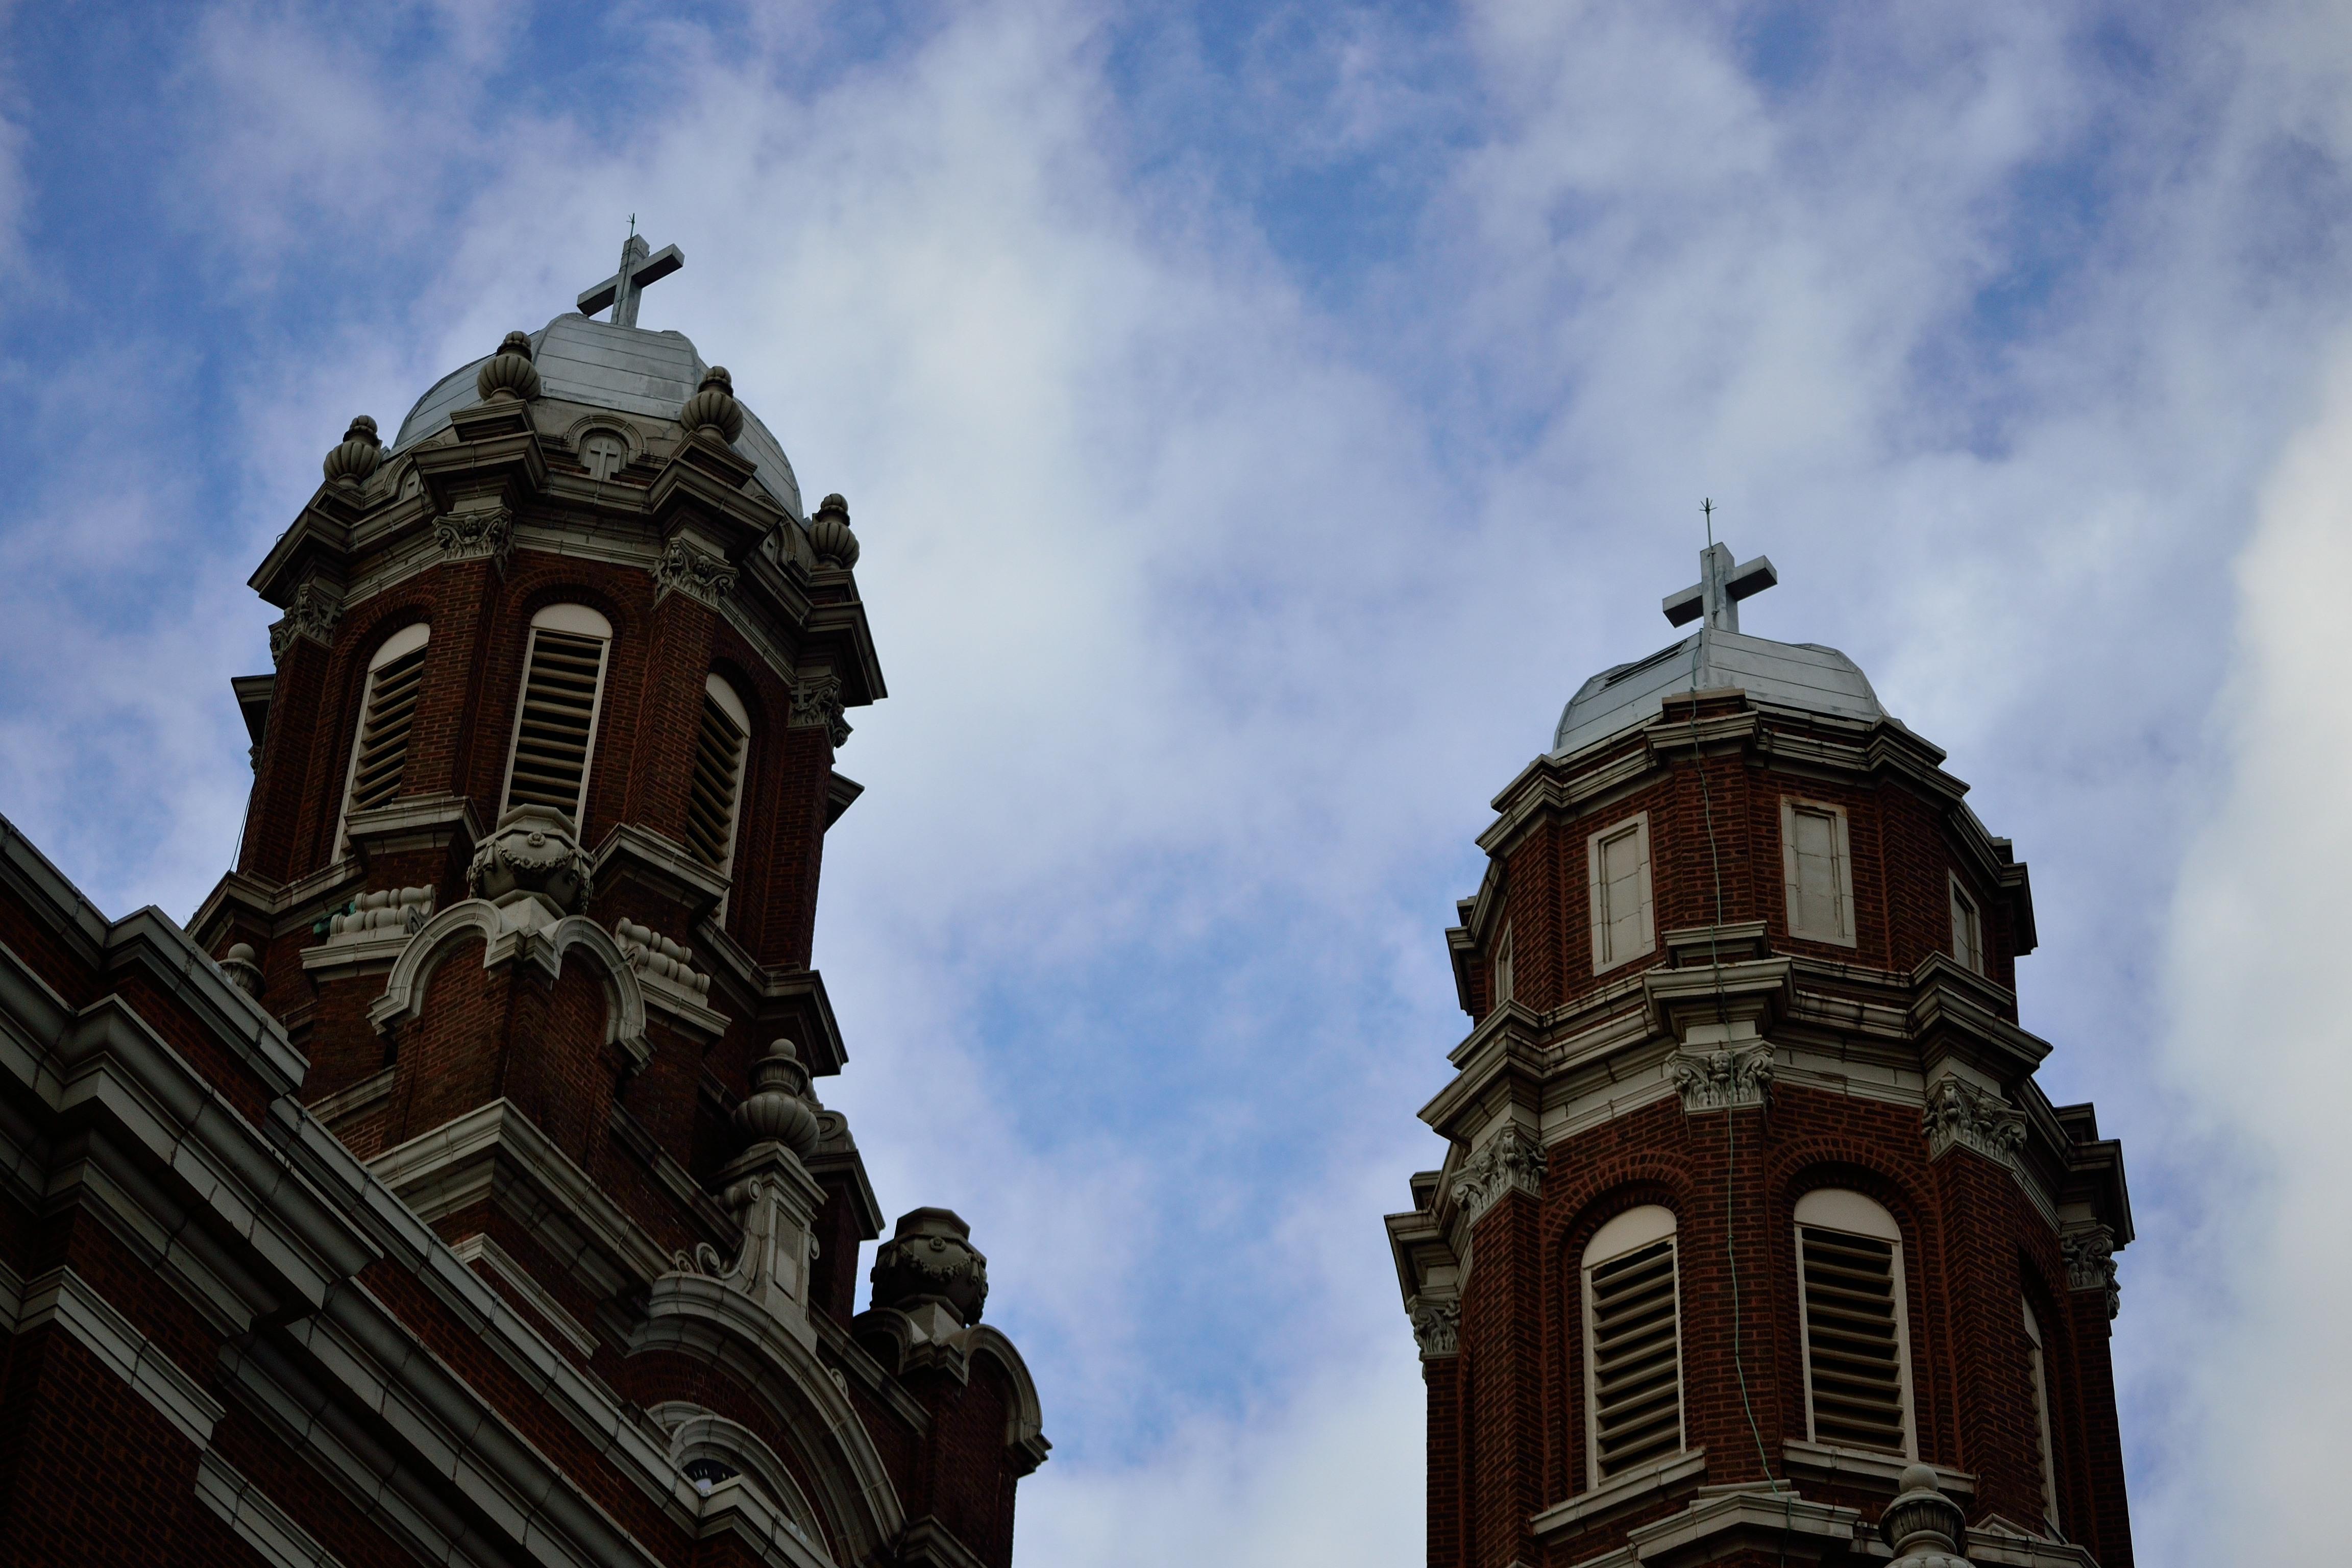 St. Hyacinth Basilica towers over the Avondale neighborhood.